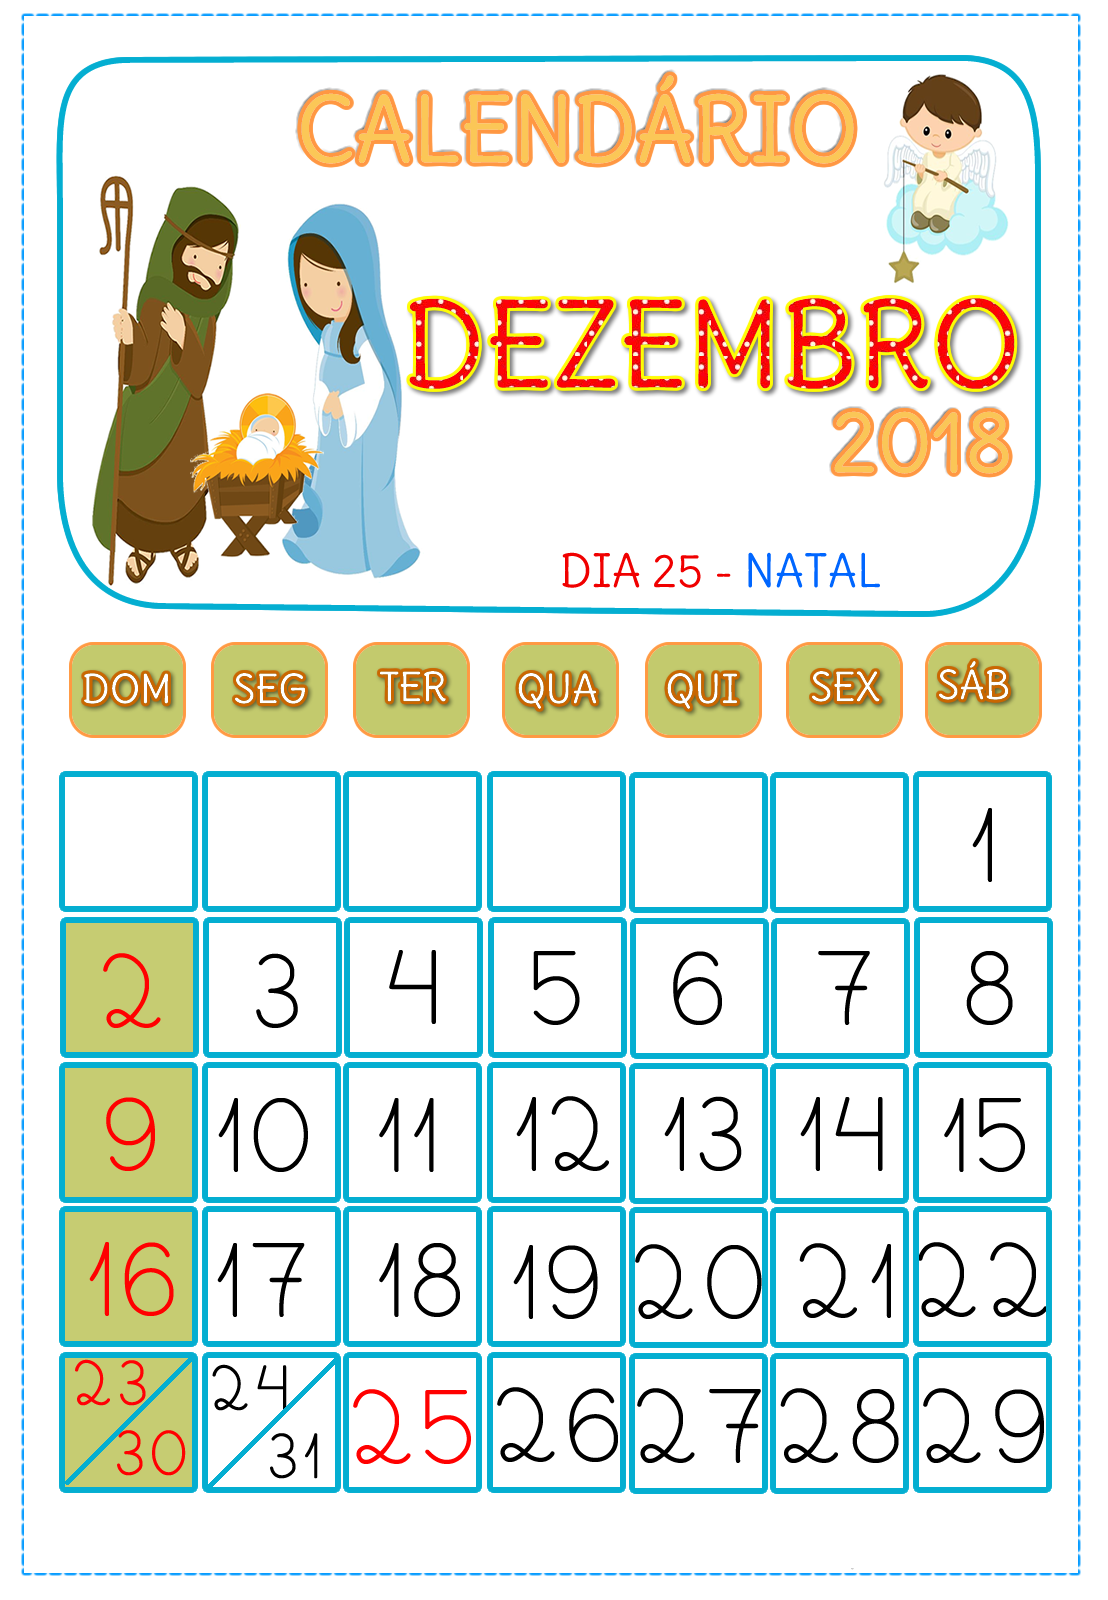 Calendario Dezembro 2018Modelo Calendário dezembro